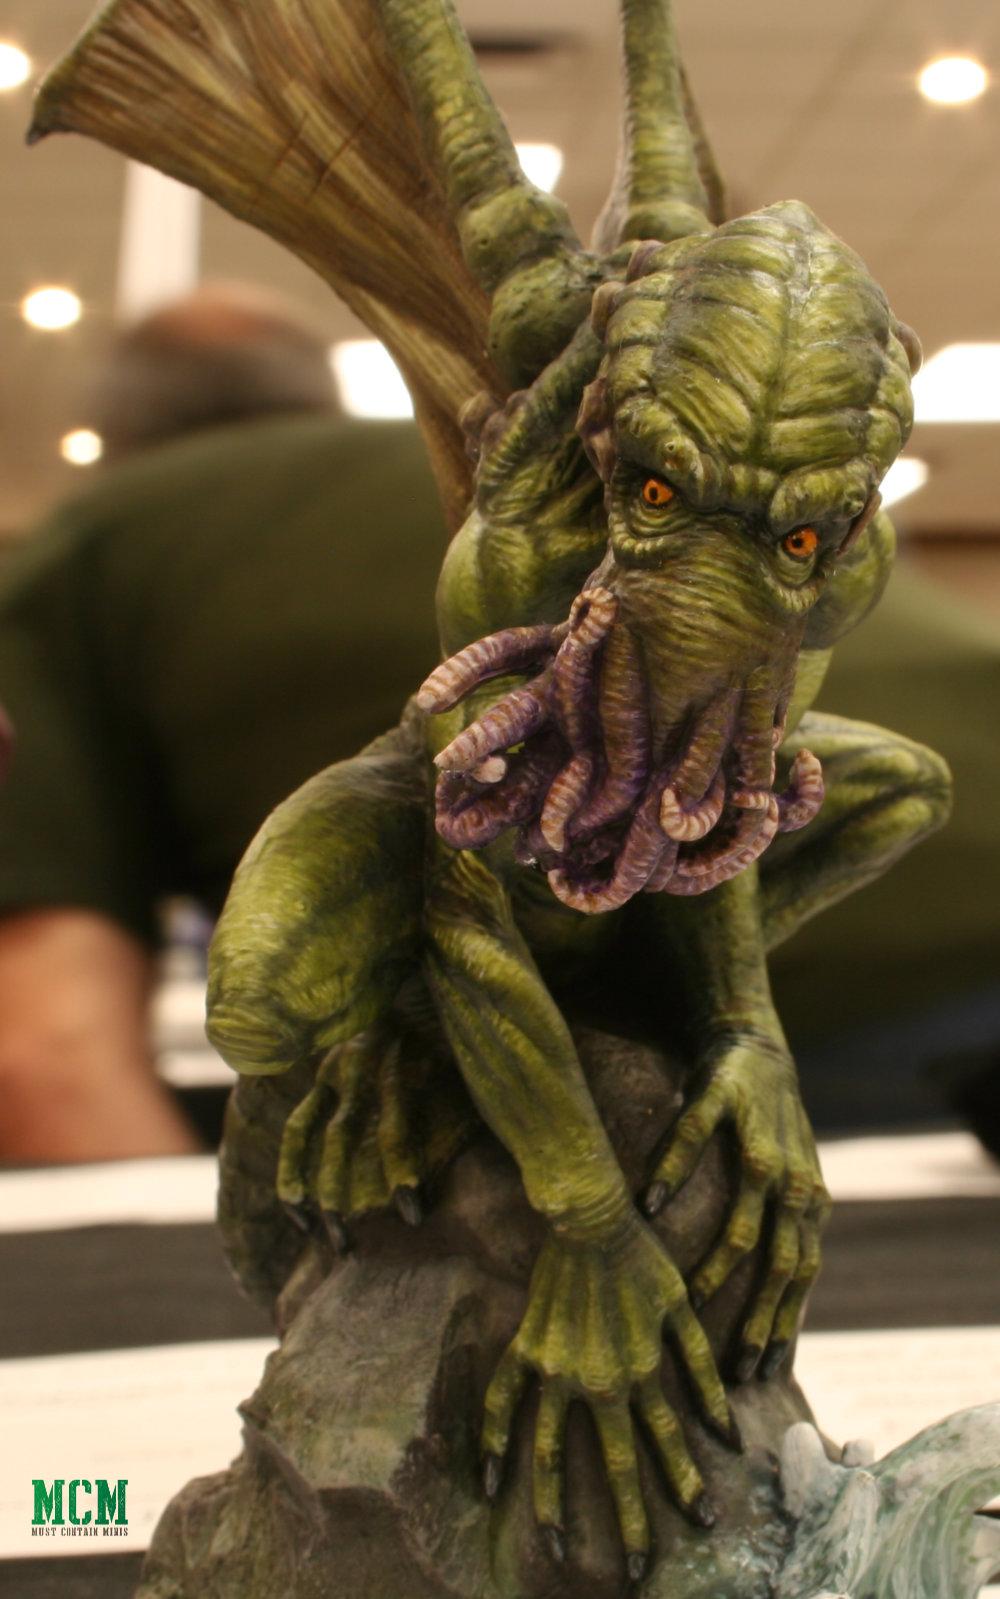 Fenris Games giant miniature